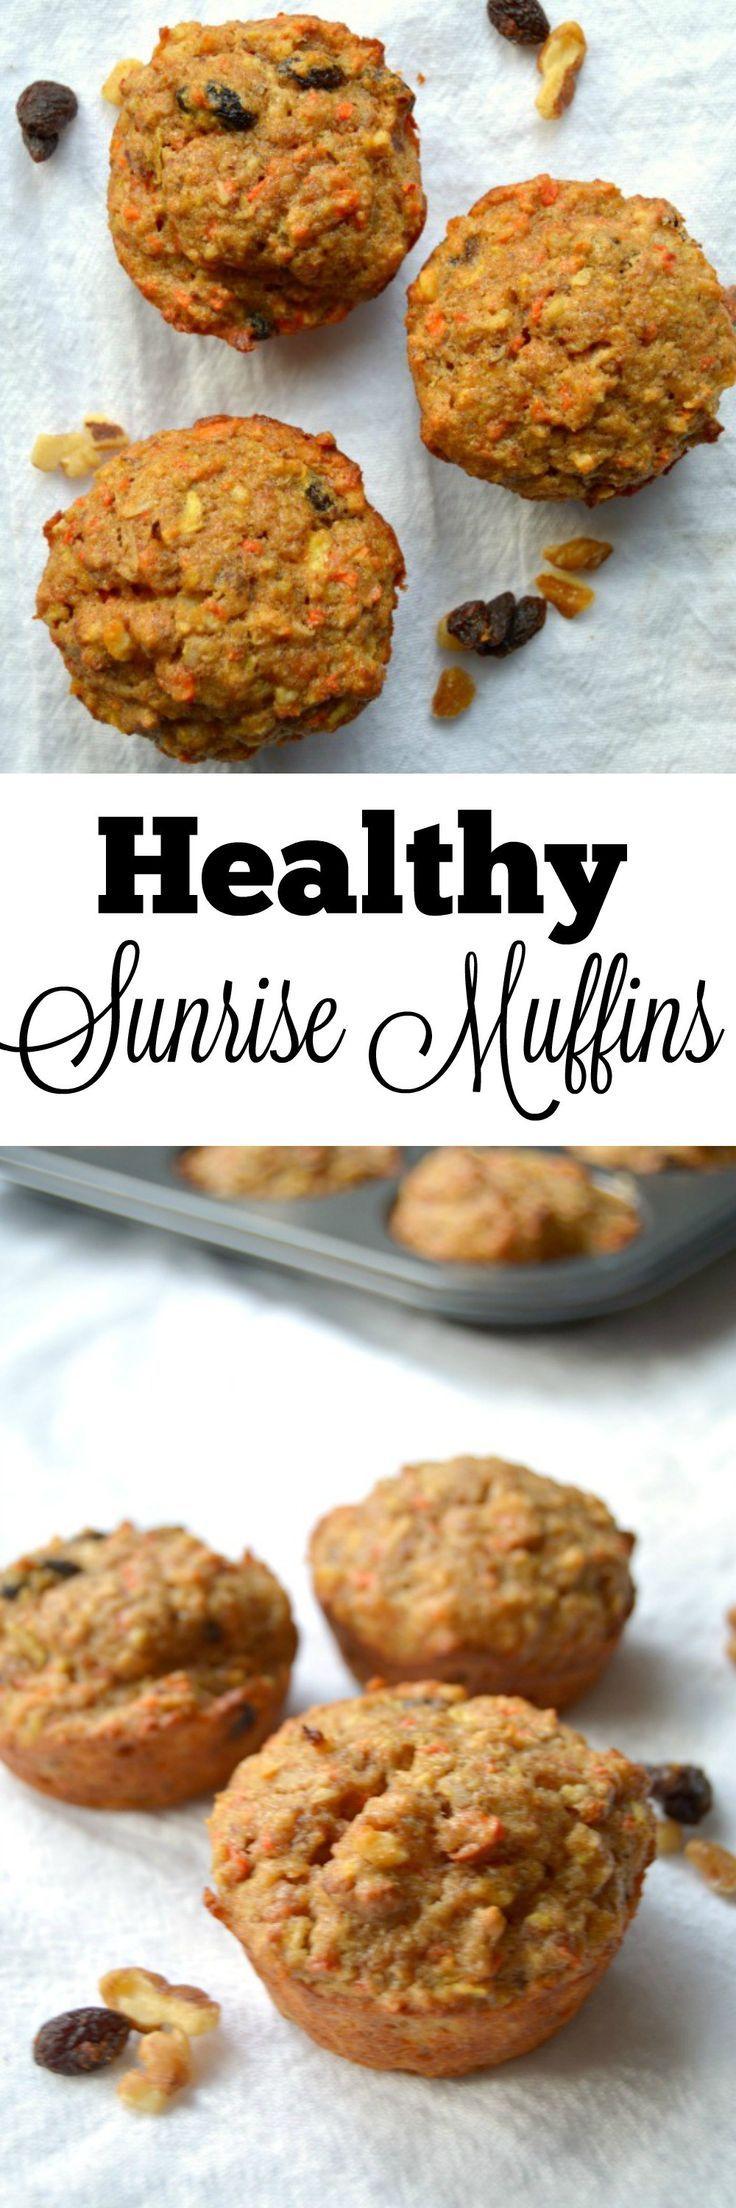 Healthy Sunrise Muffins - Healthy Muffins - Sunrise Muffins - Morning Glory Muffins - Carrot Cake Muffins - Low Fat Muffins - Sugar Free Muffins